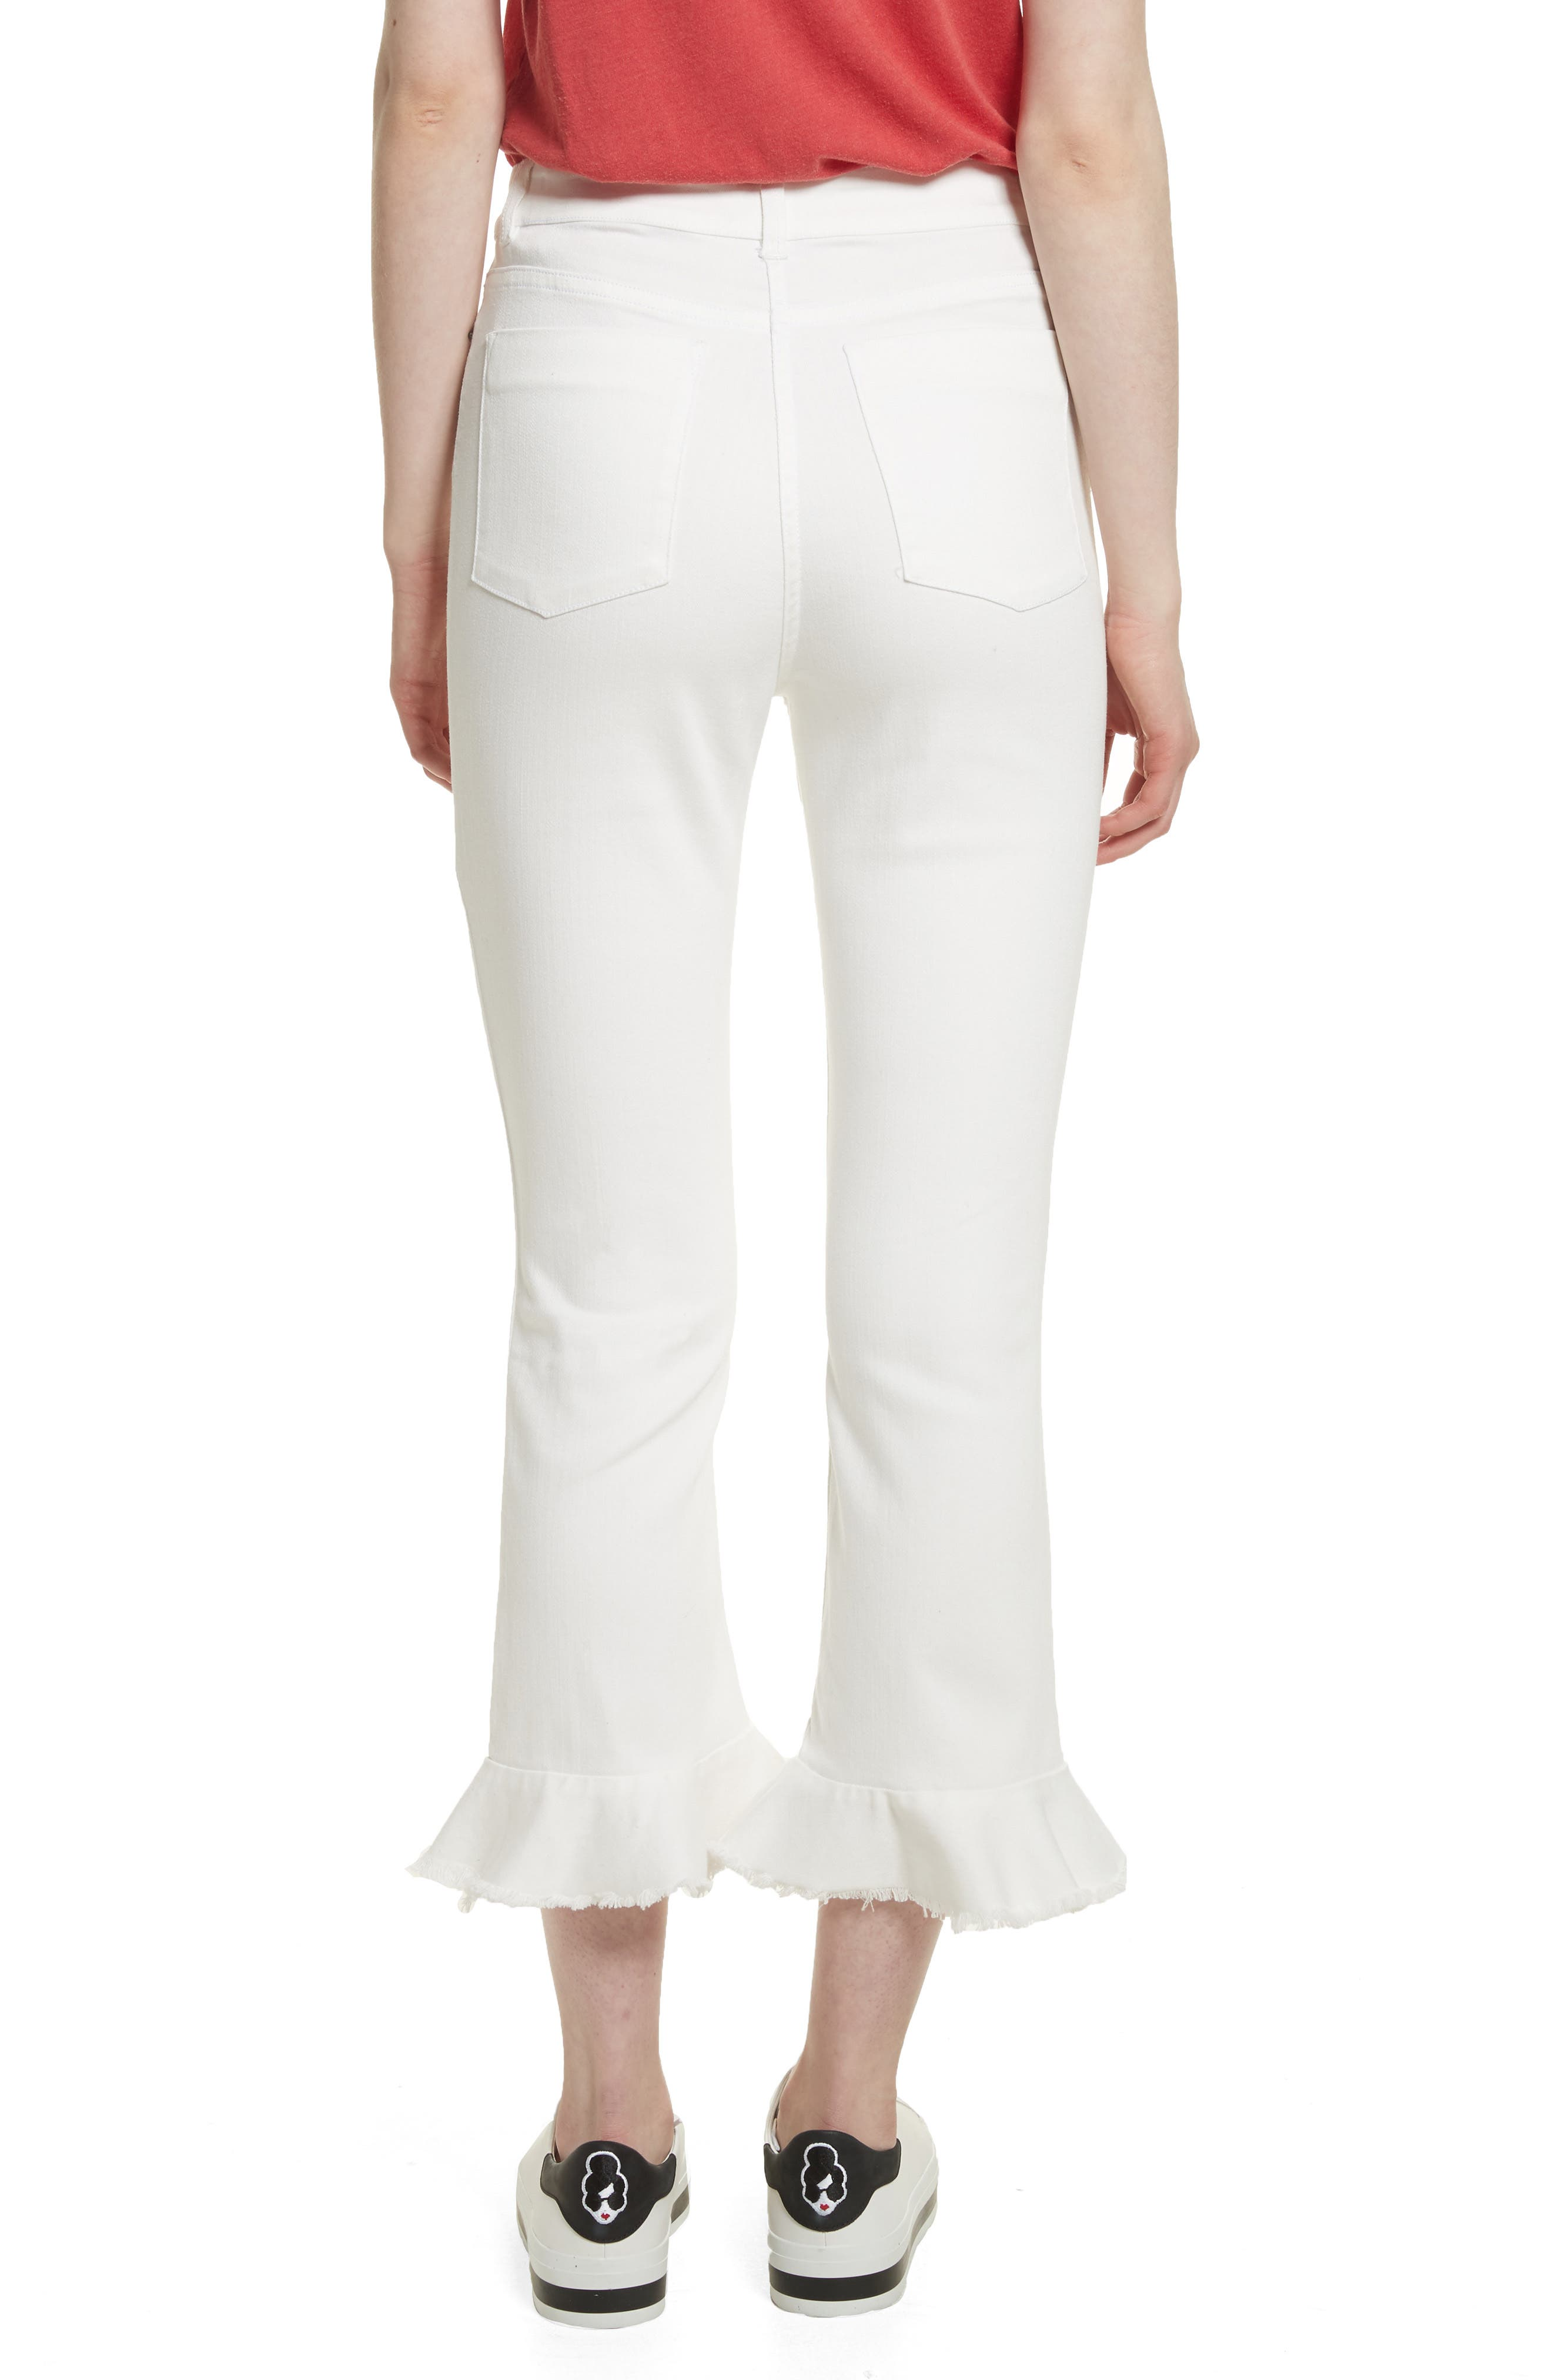 AO.LA Zoe Ruffle Hem Crop Jeans,                             Alternate thumbnail 2, color,                             White